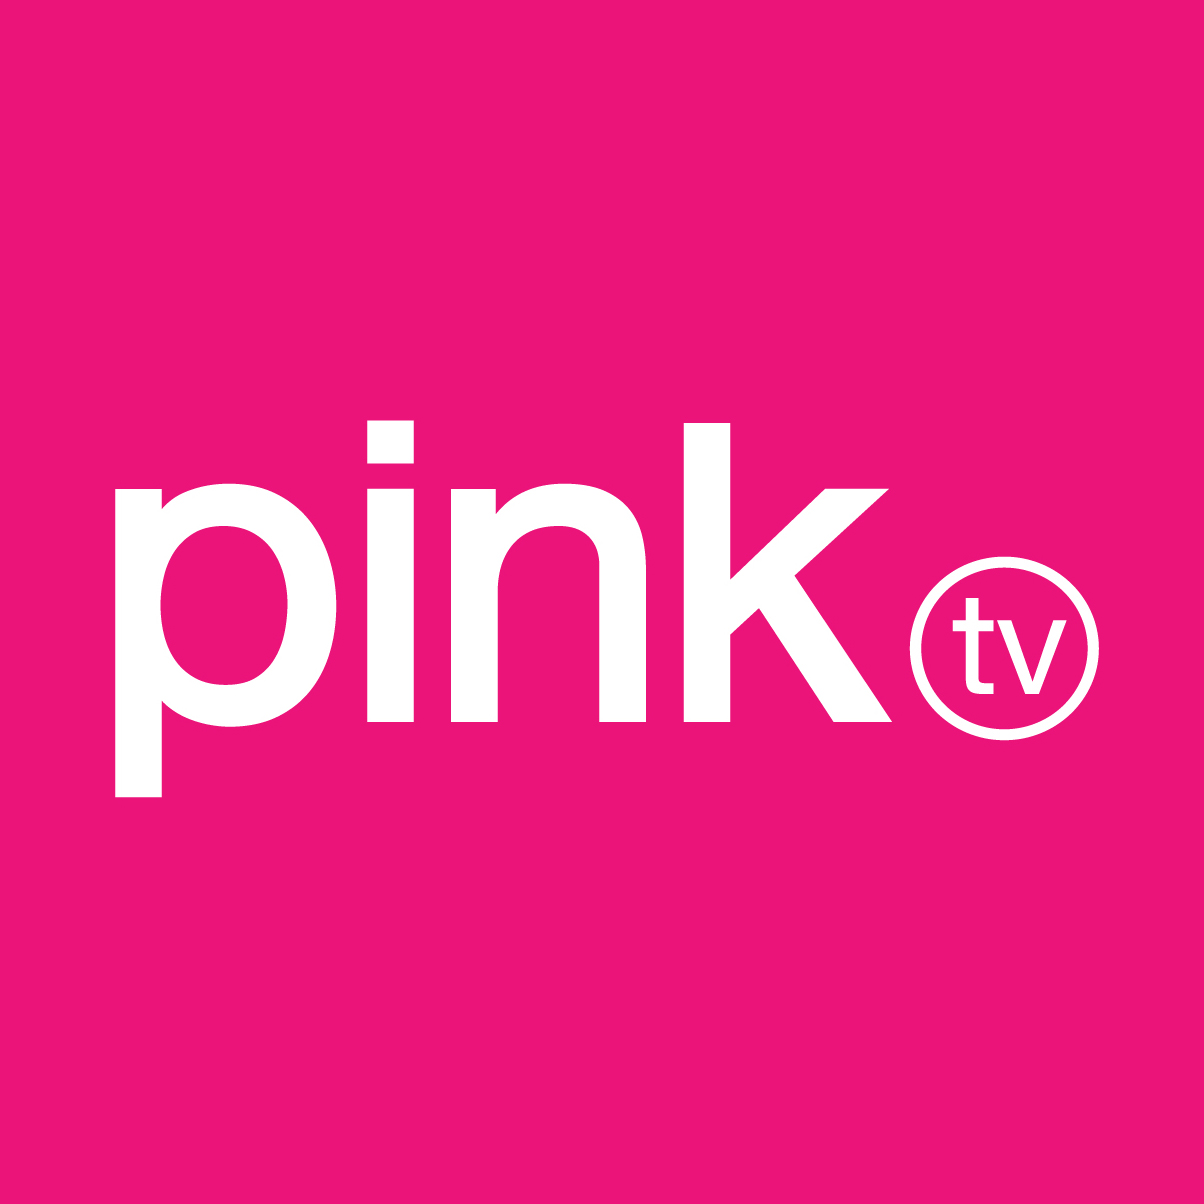 pin pink plus tv live rts 1 klikni zdola uzivo on pinterest. Black Bedroom Furniture Sets. Home Design Ideas